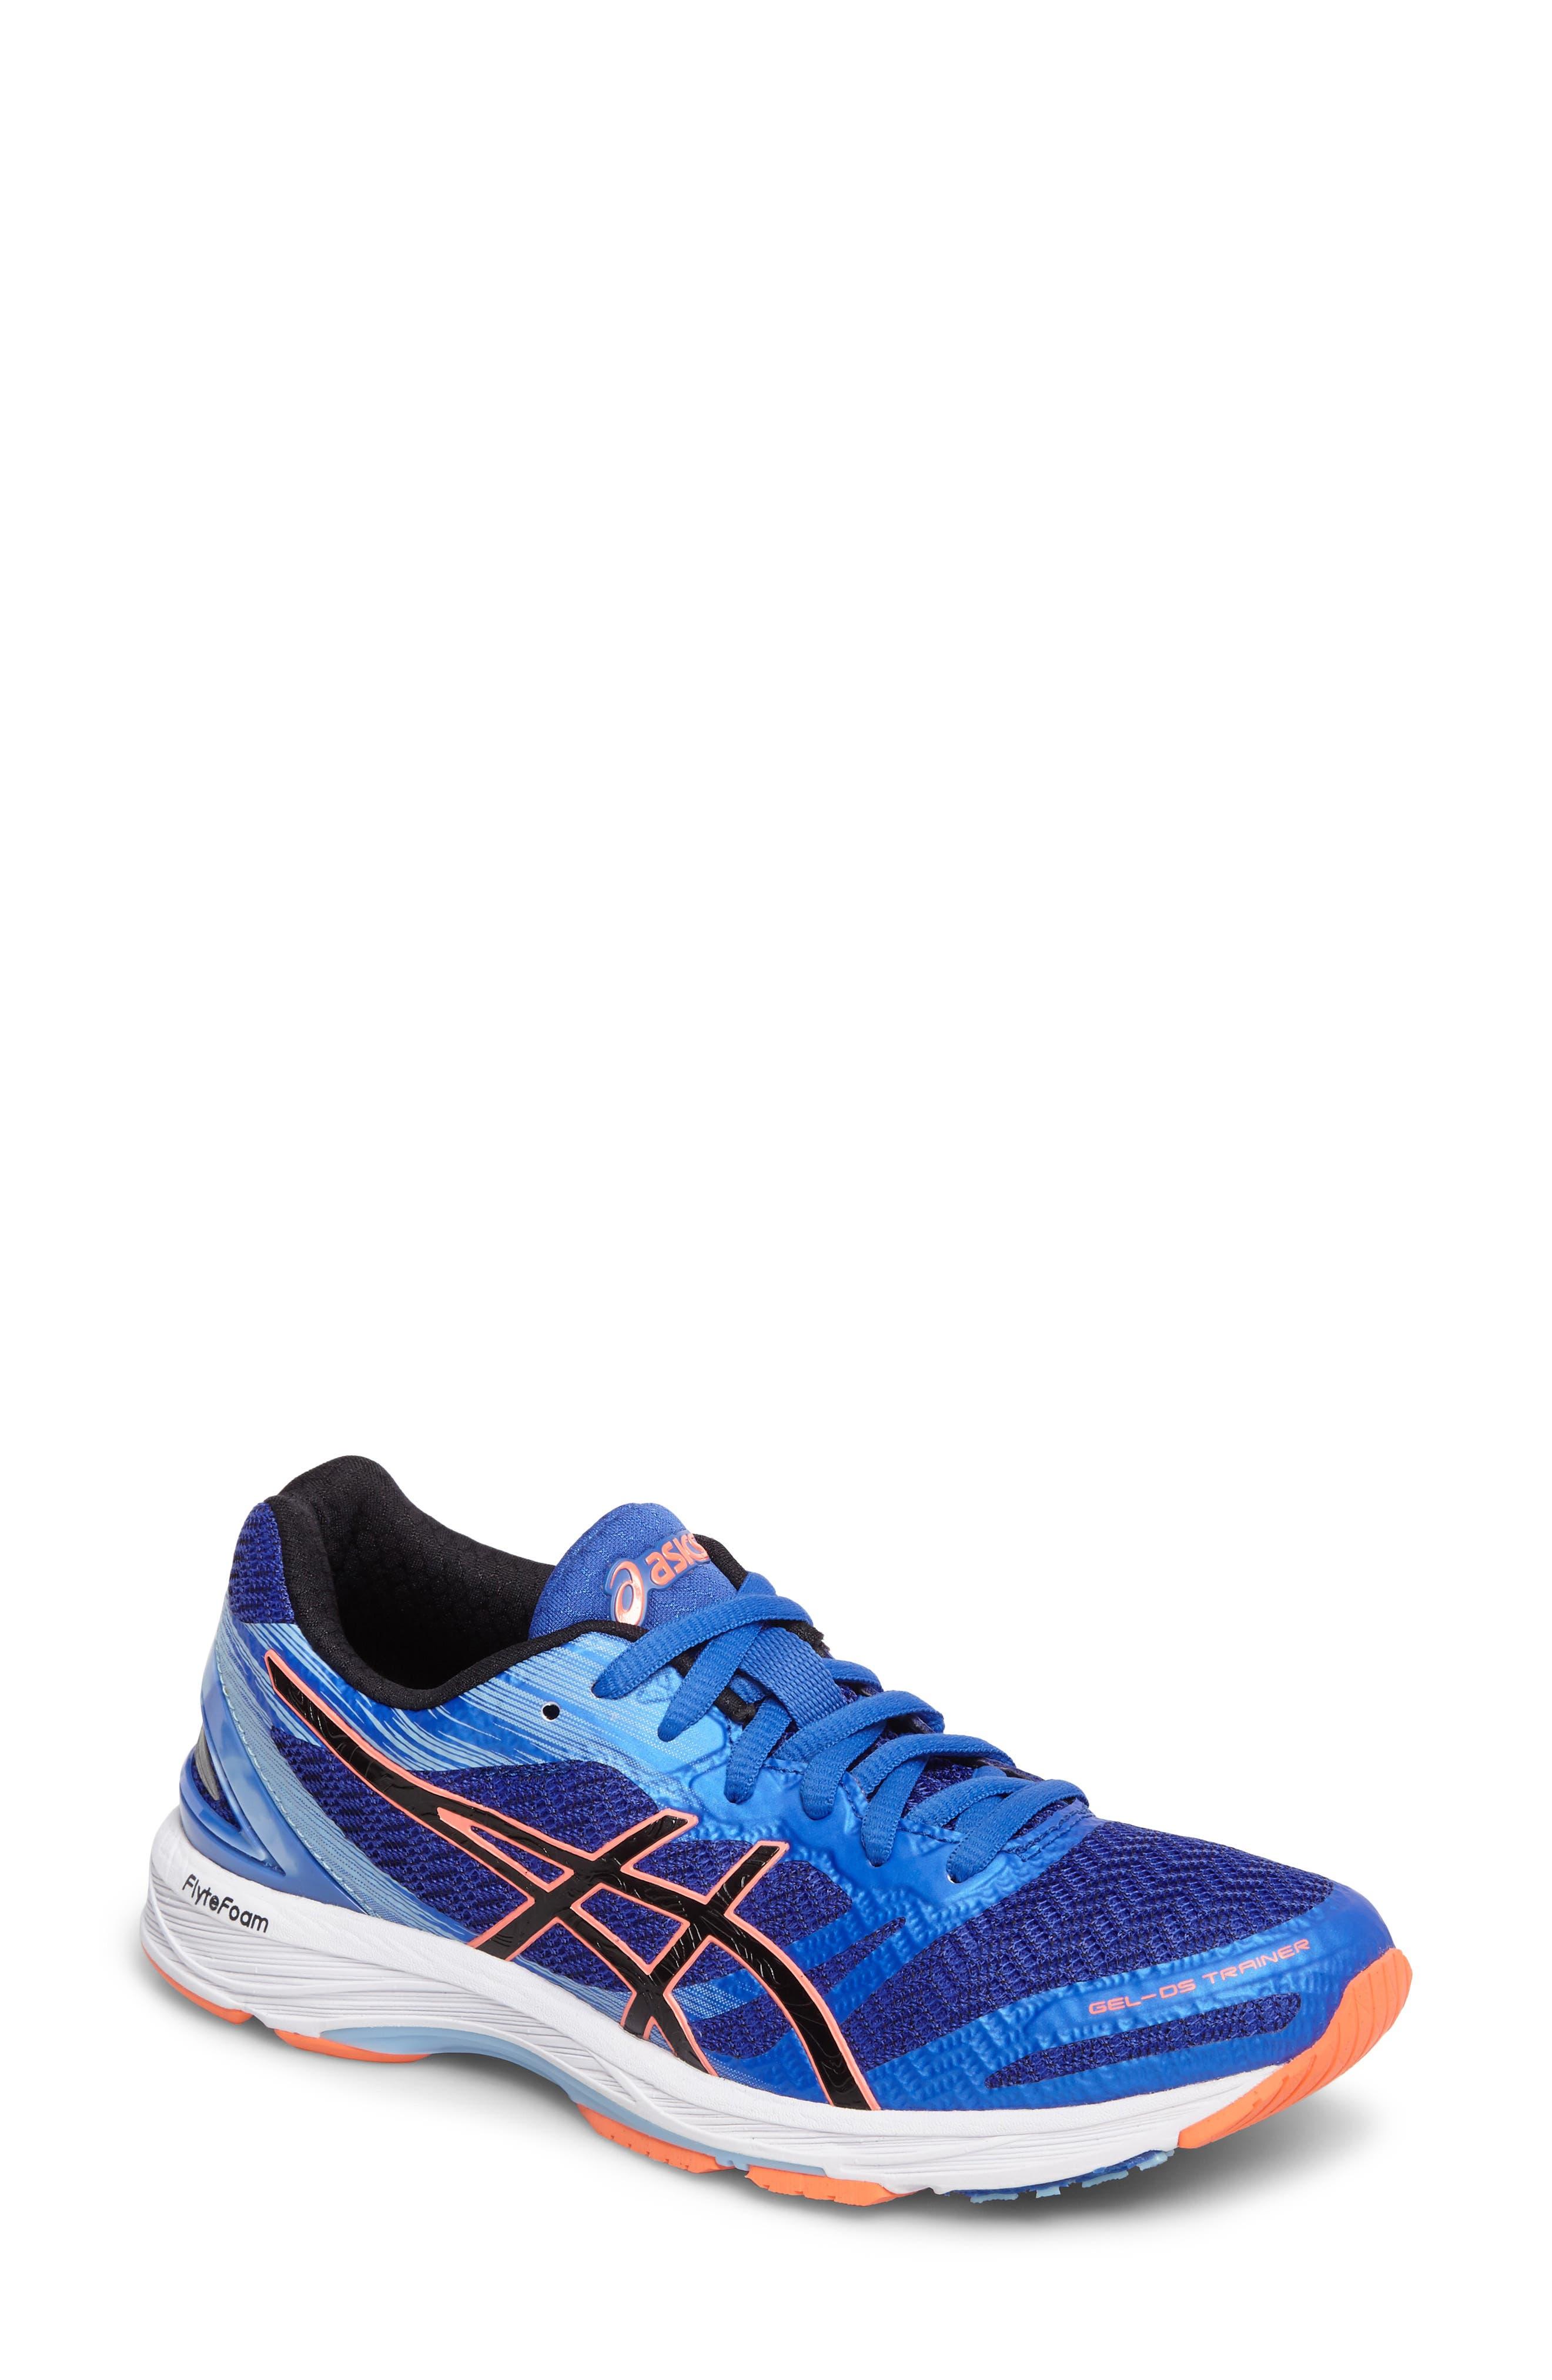 GEL-DS Trainer 22 Running Shoe,                             Main thumbnail 1, color,                             Blue Purple/ Black/ Coral